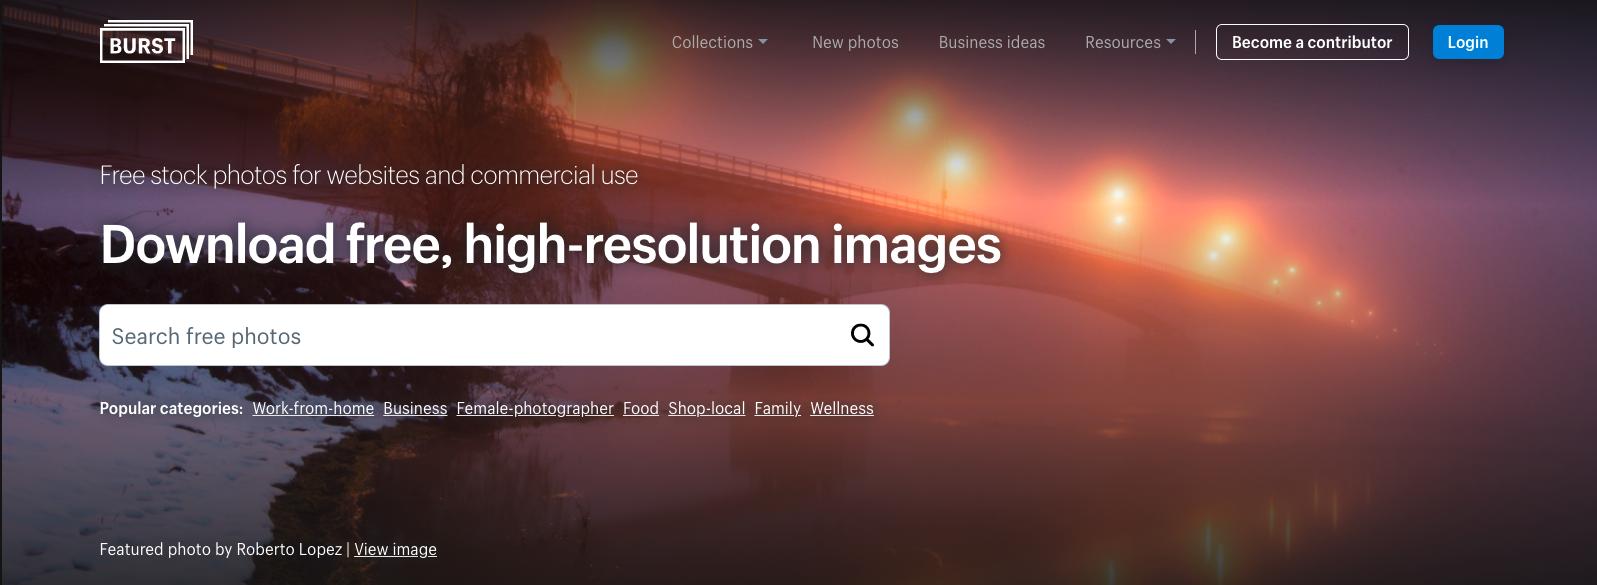 Burst home page screengrab